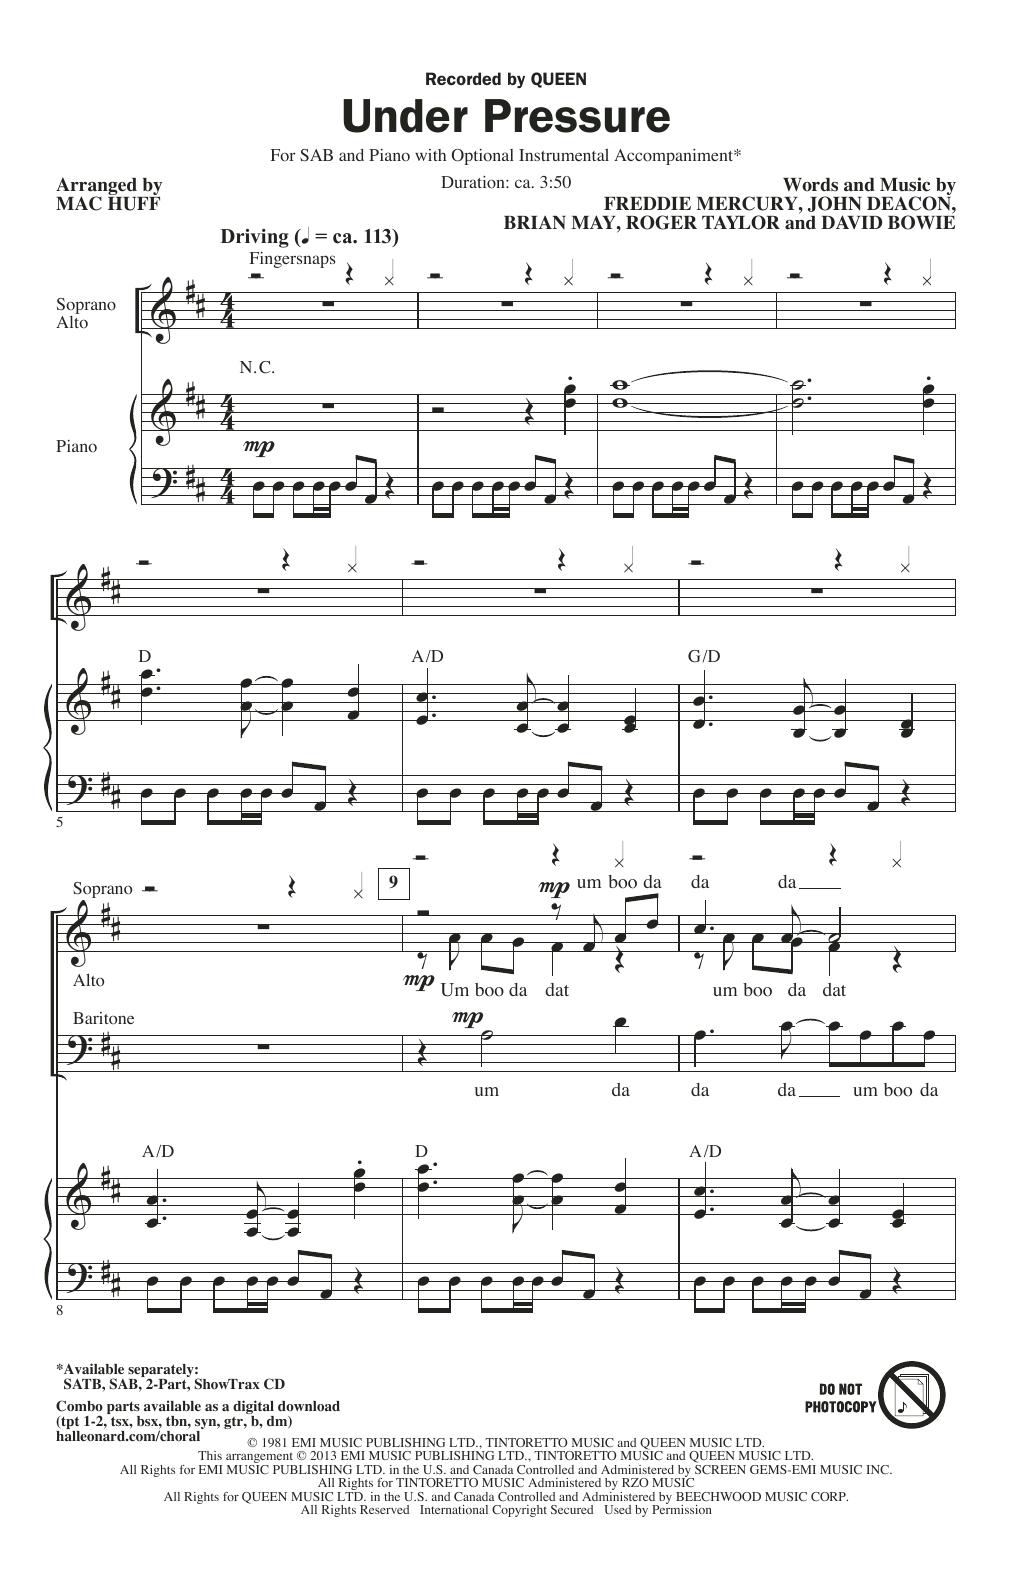 Under Pressure (arr. Mac Huff) Sheet Music